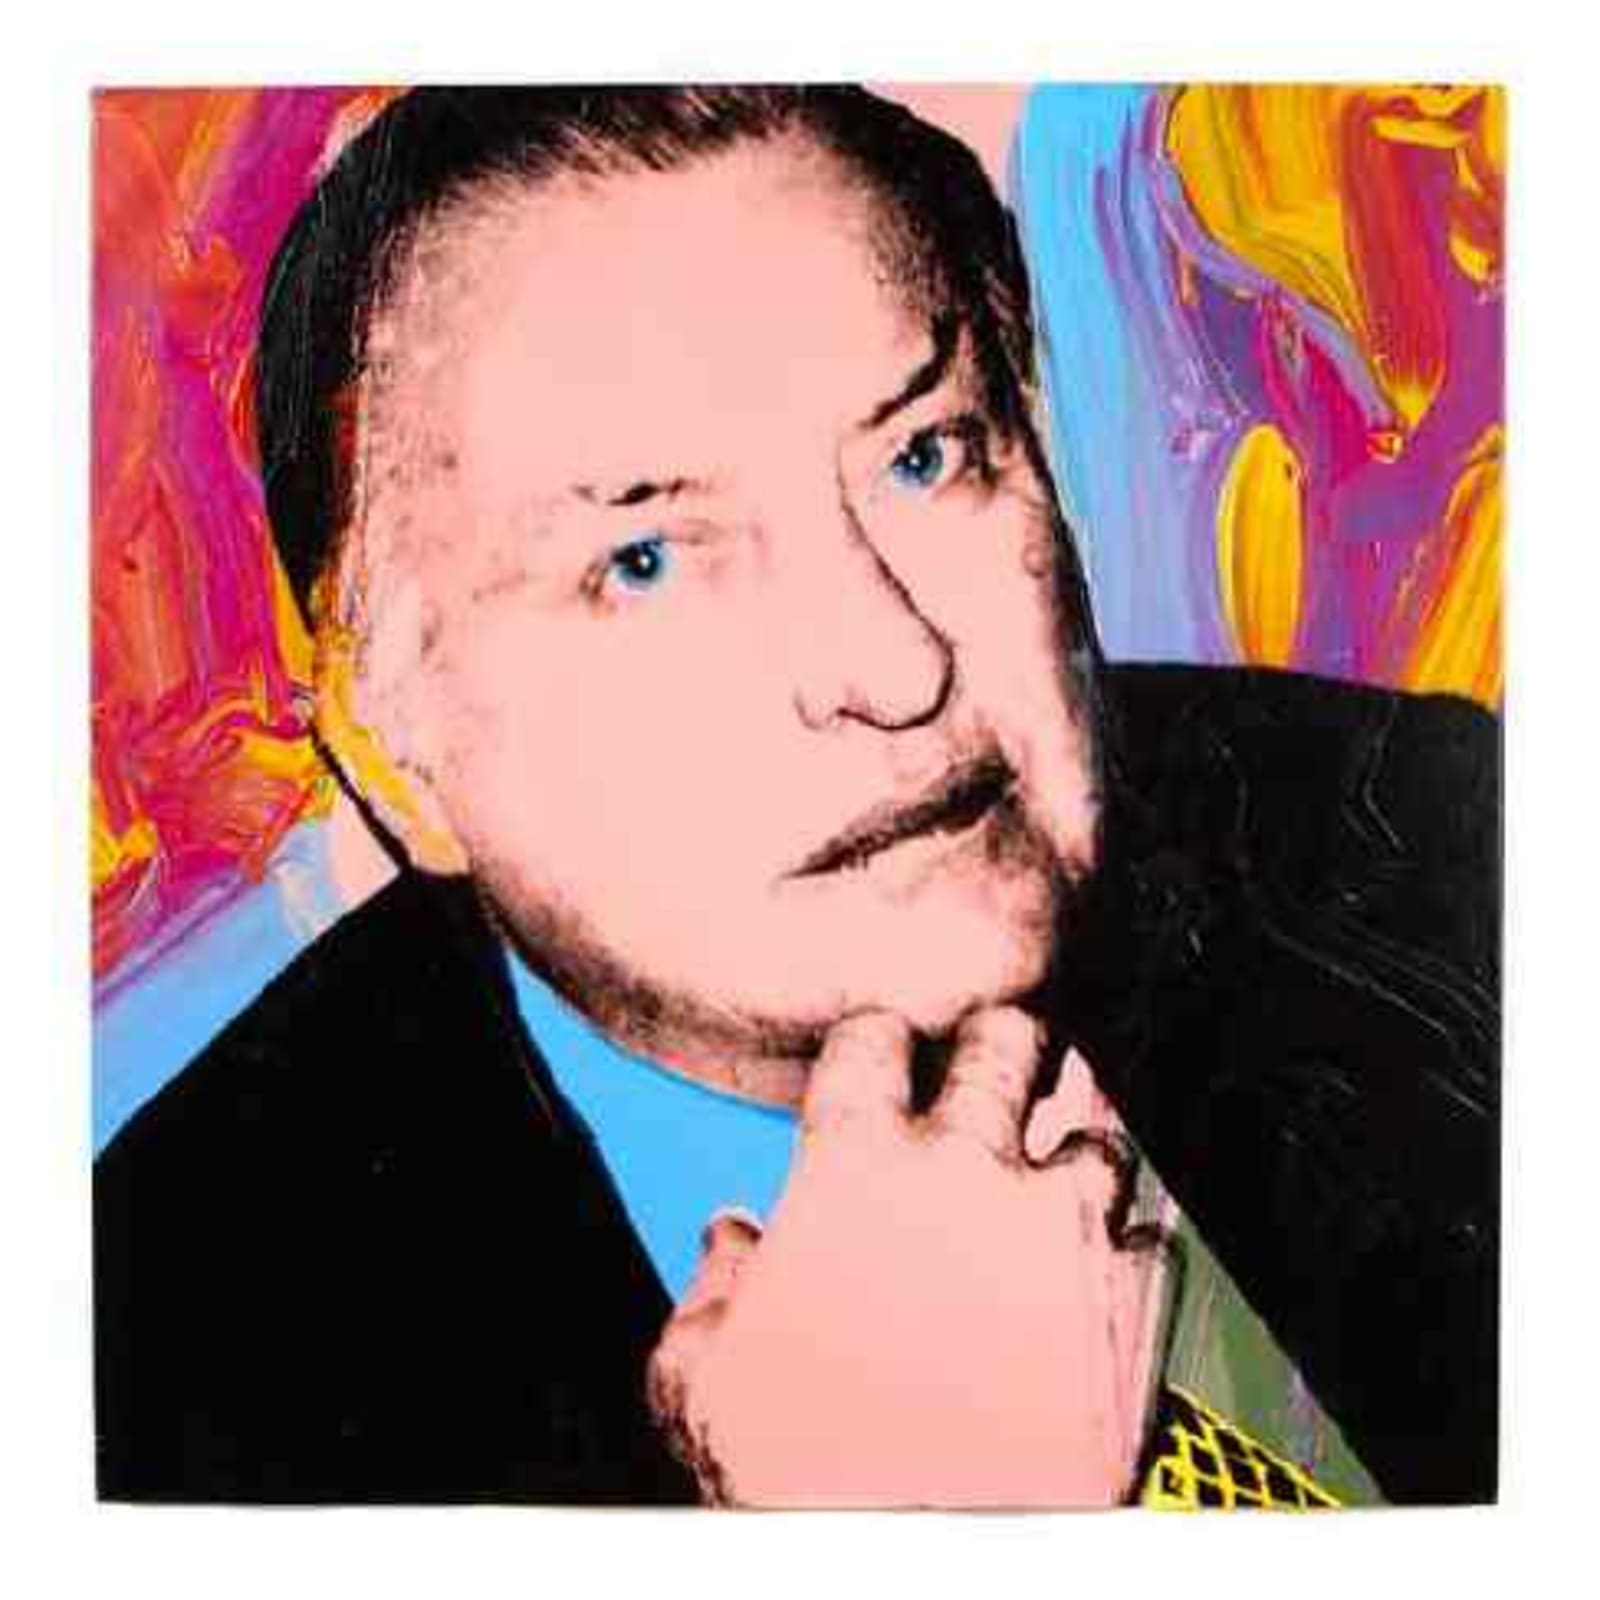 Andy Warhol, Portrait of Charles Ireland, 1979